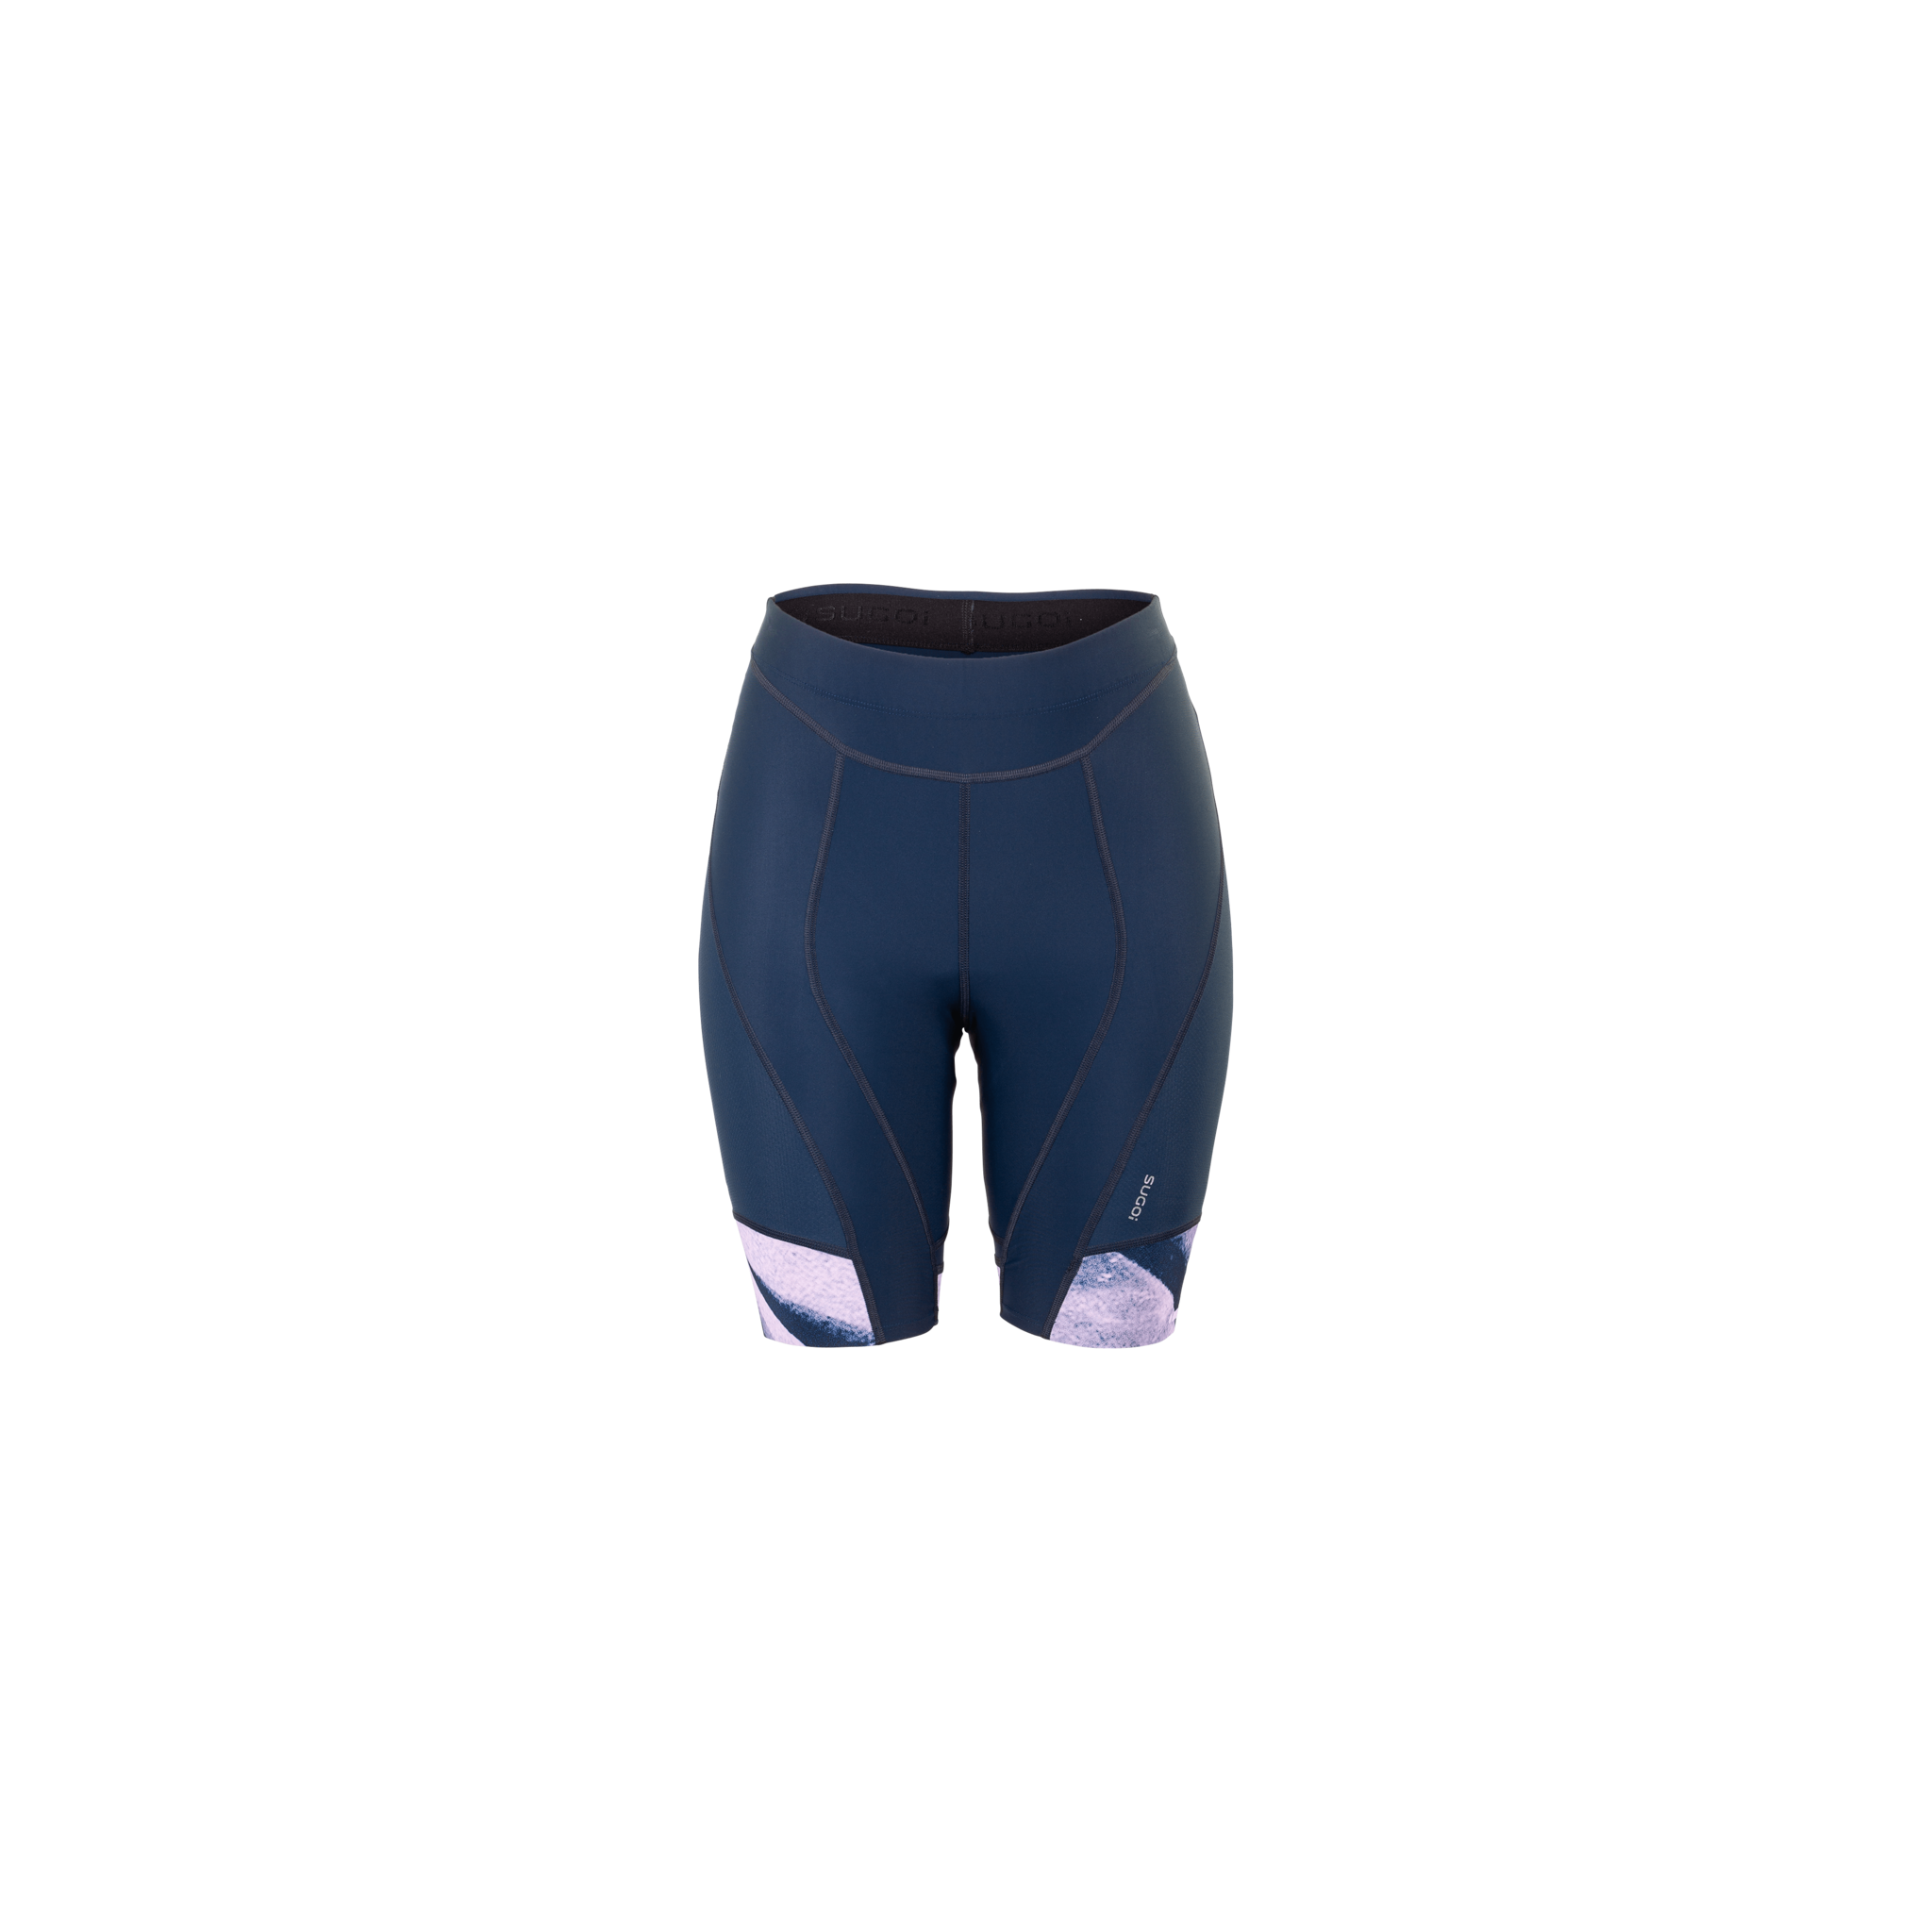 Sugoi RS Bib Pantalon Short de Cyclisme